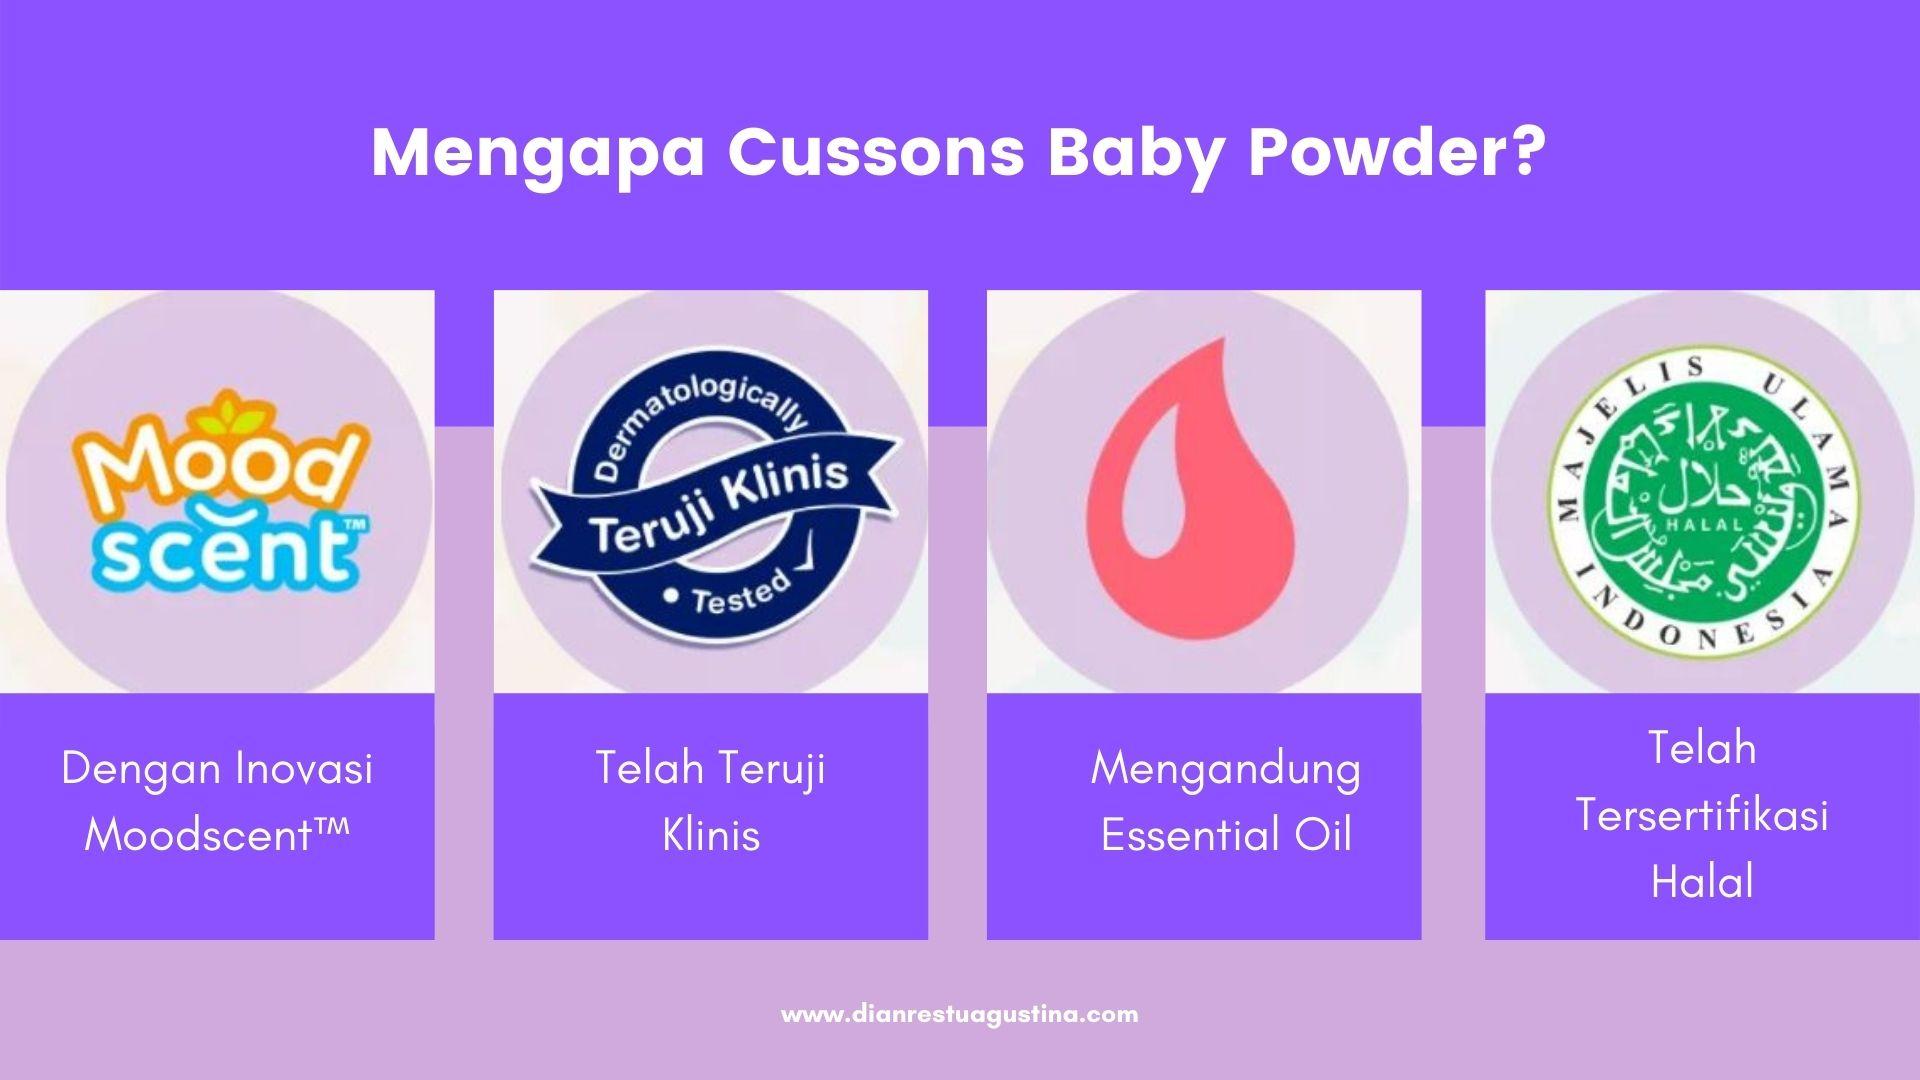 Mengapa Cussons Baby Powder?